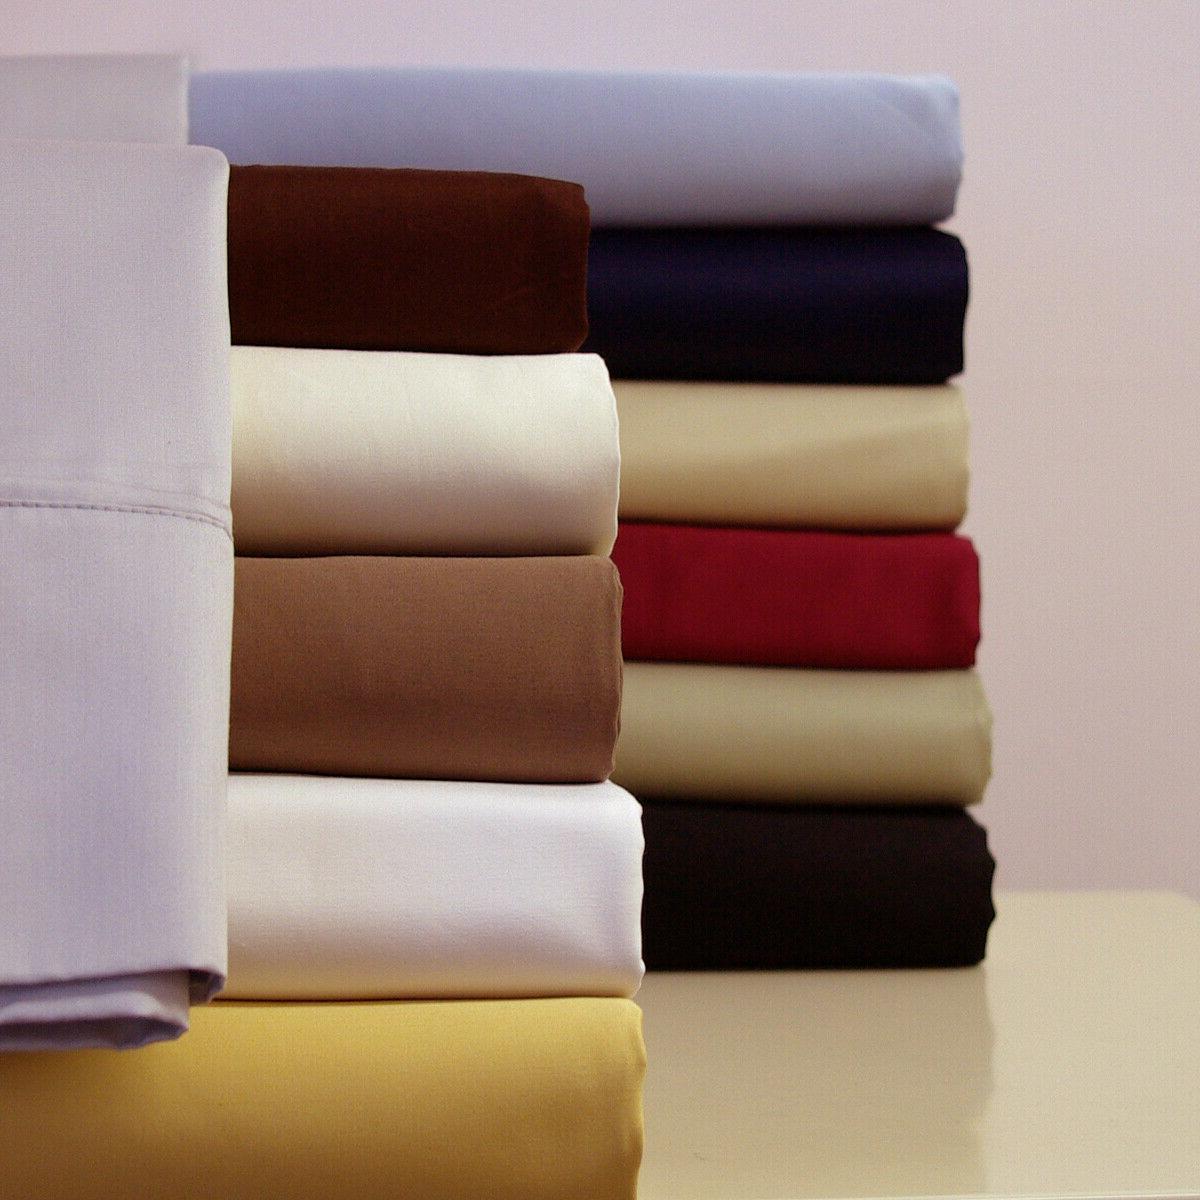 100 percent cotton sheets 550 thread count